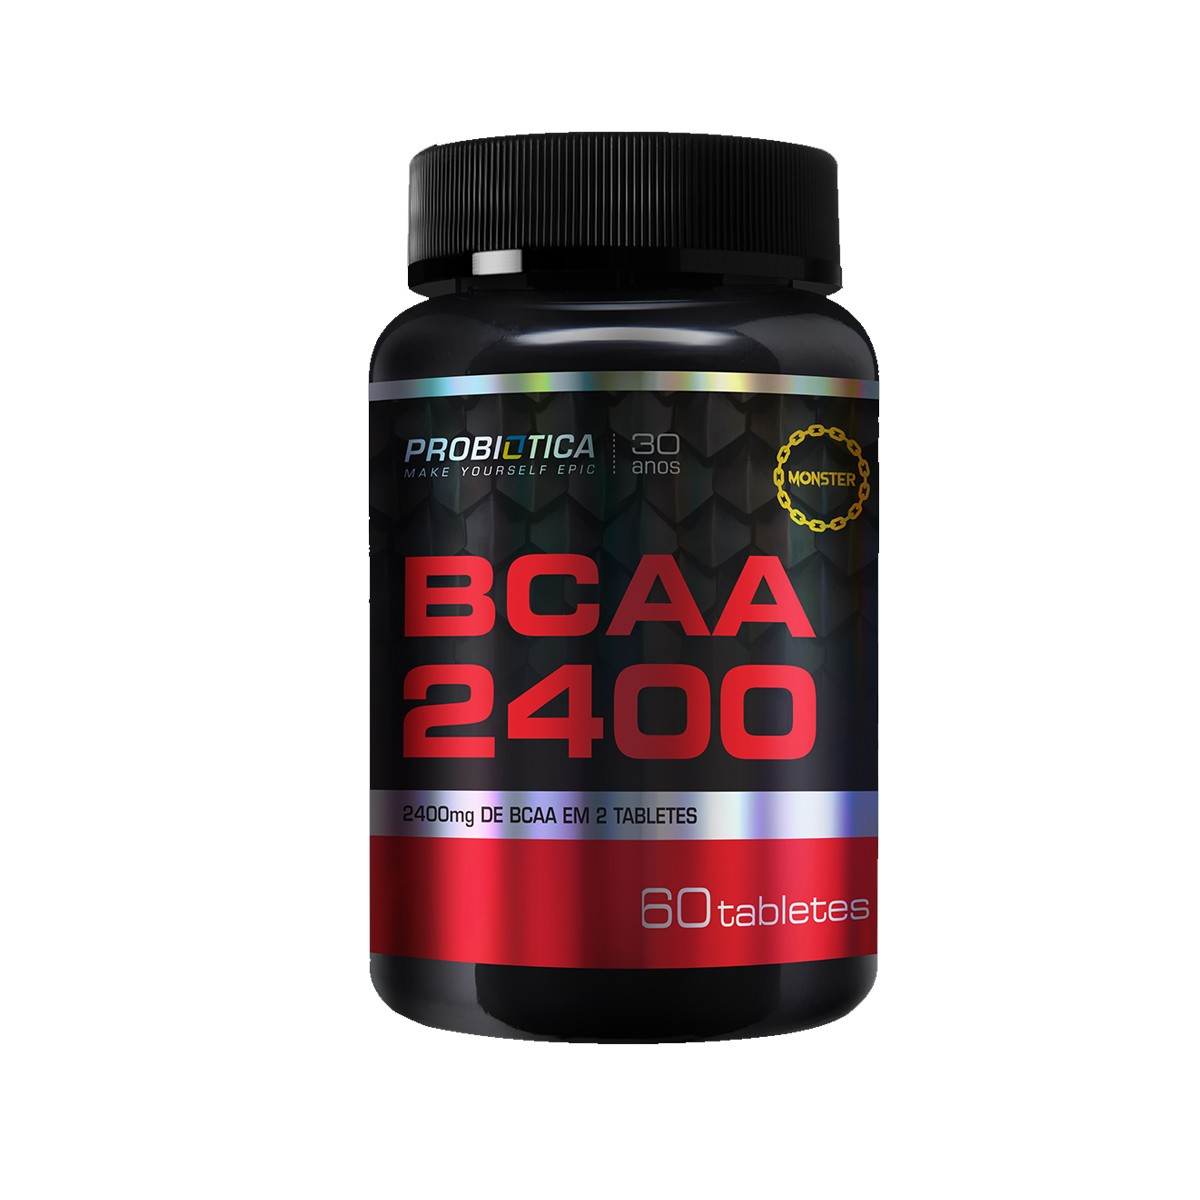 BCAA 2400mg 60 Tabletes - Probiotica